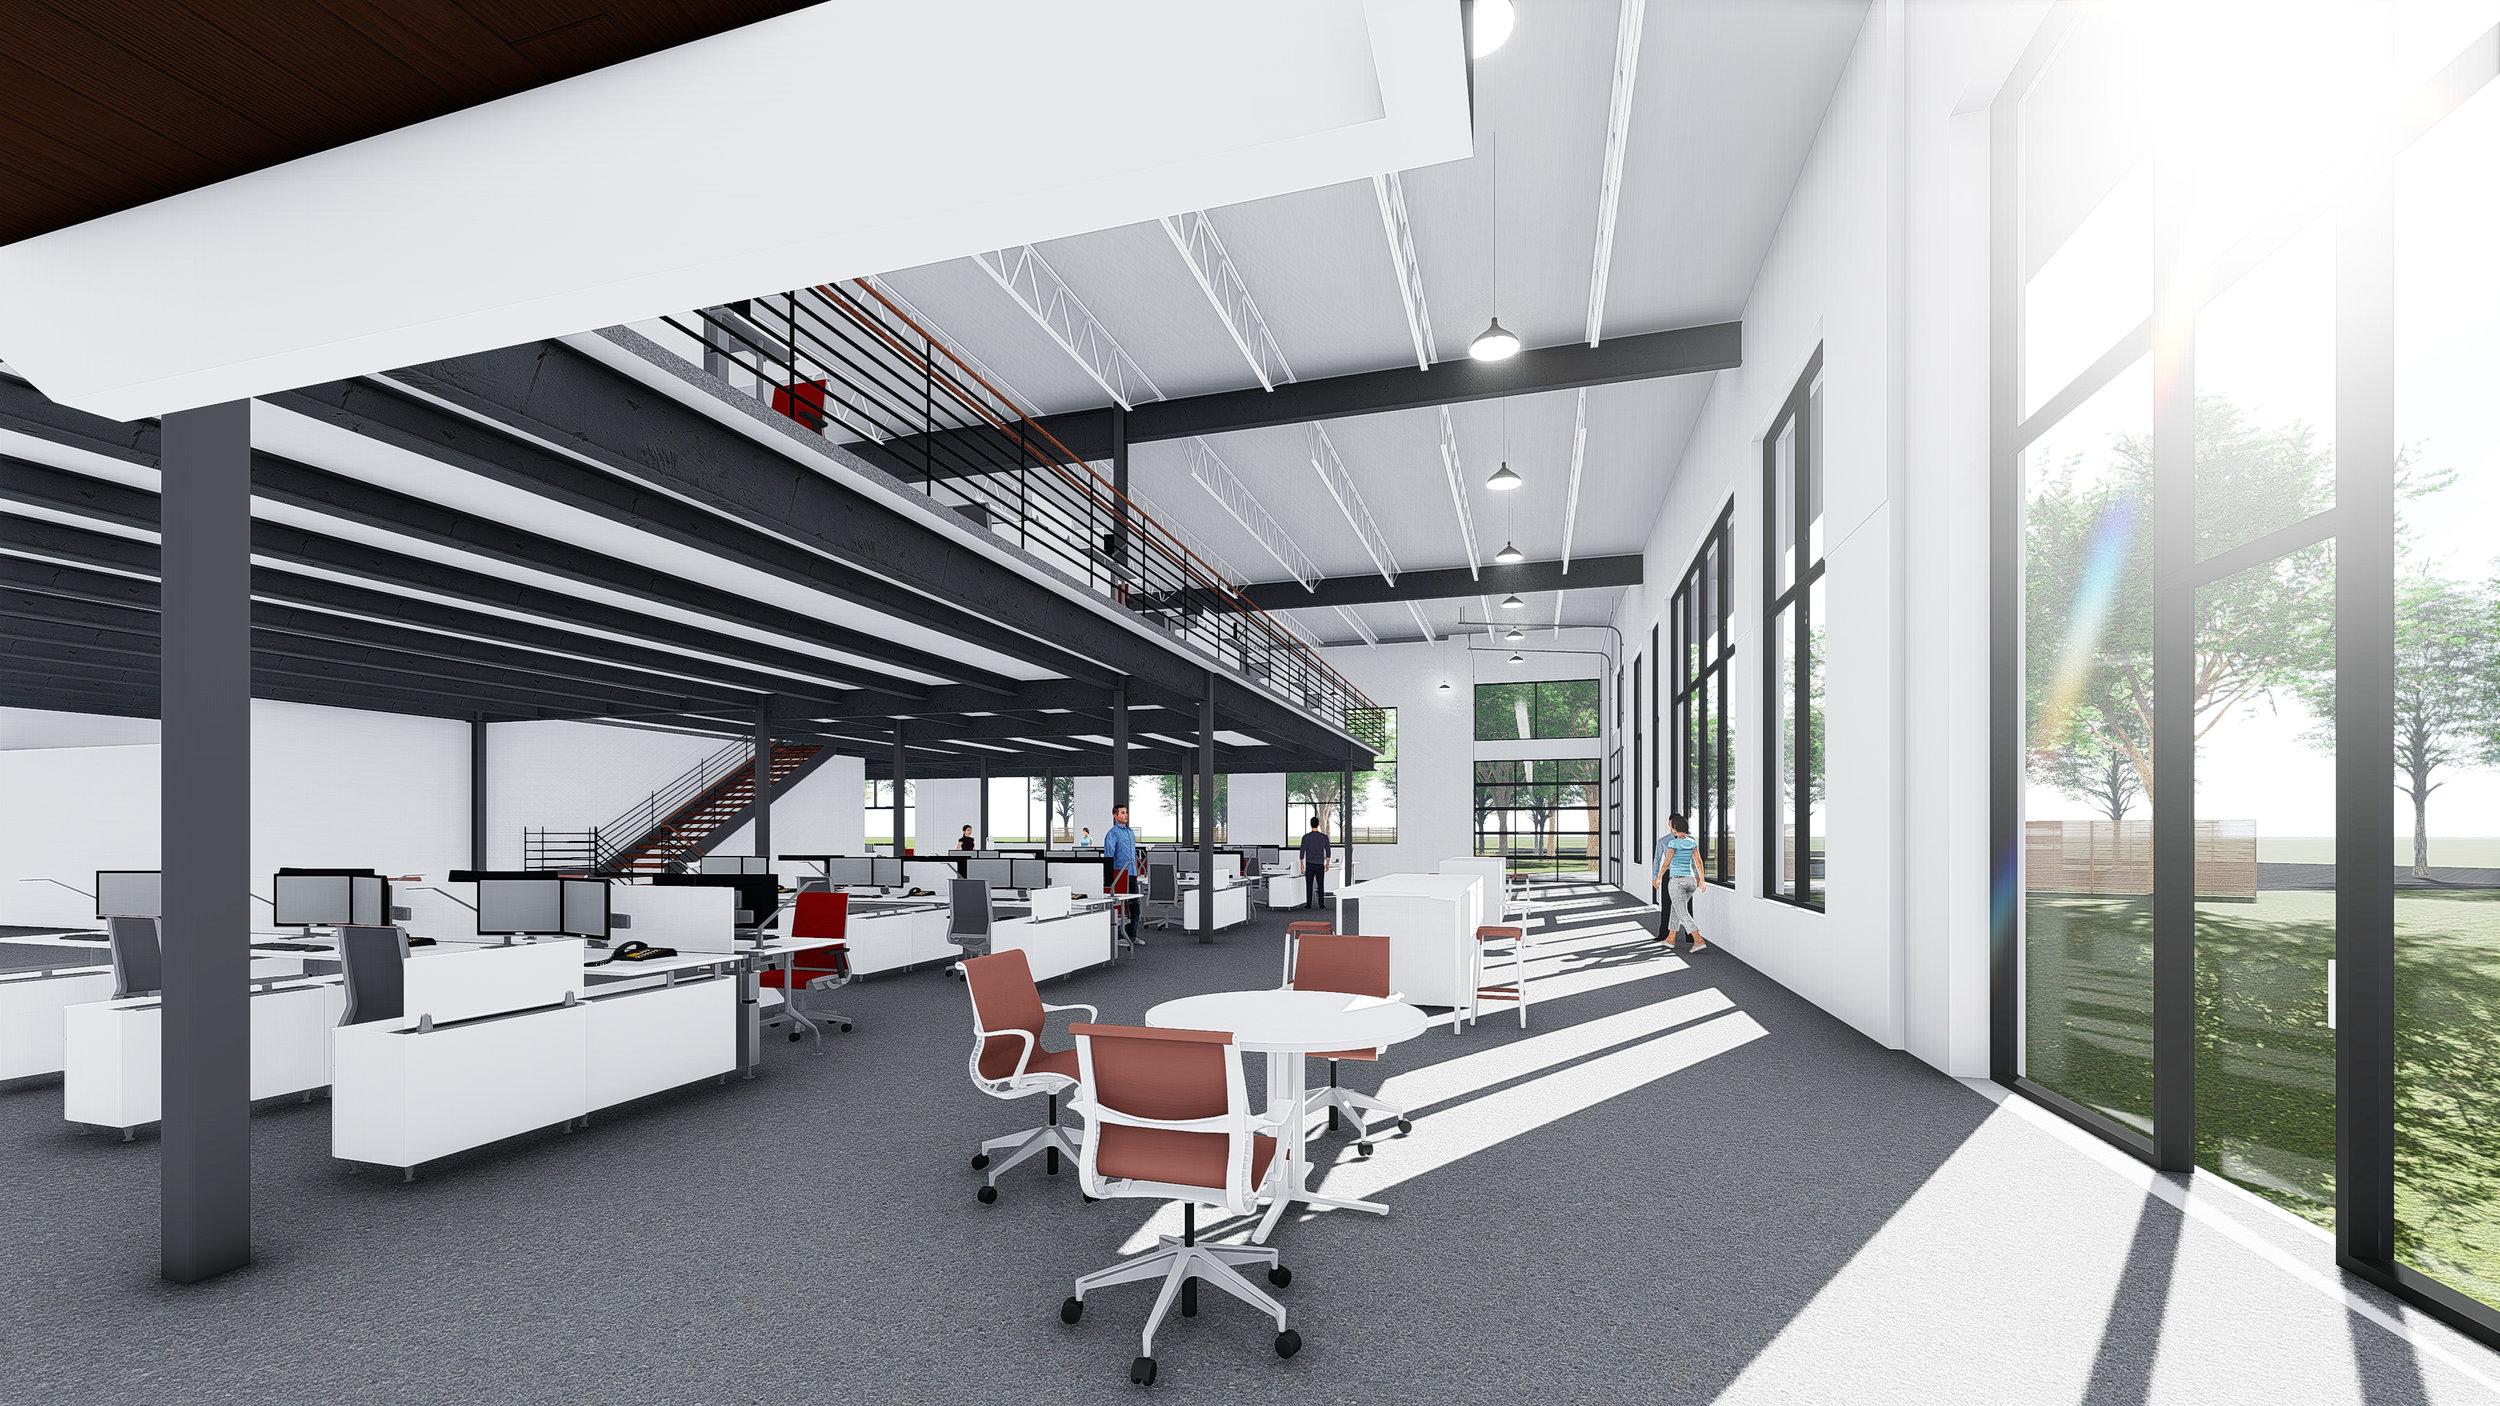 - 4001 creative office